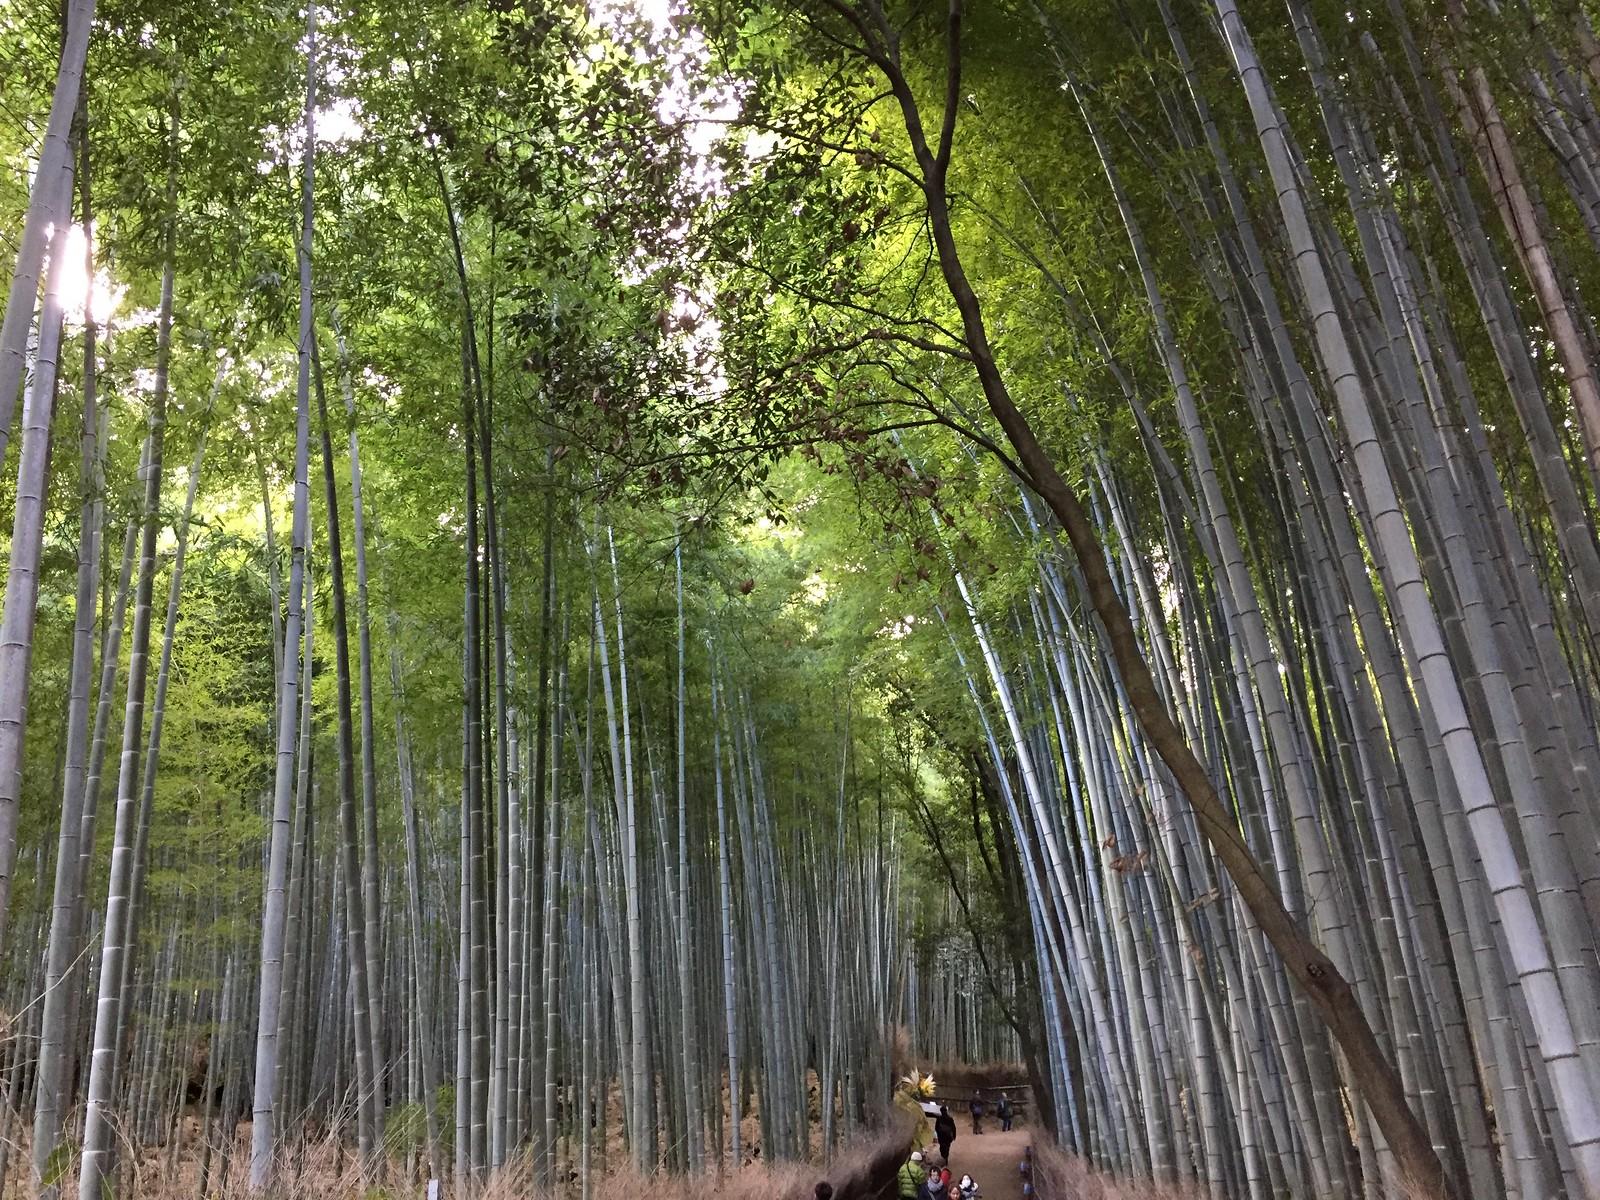 18. Bamboo Grove